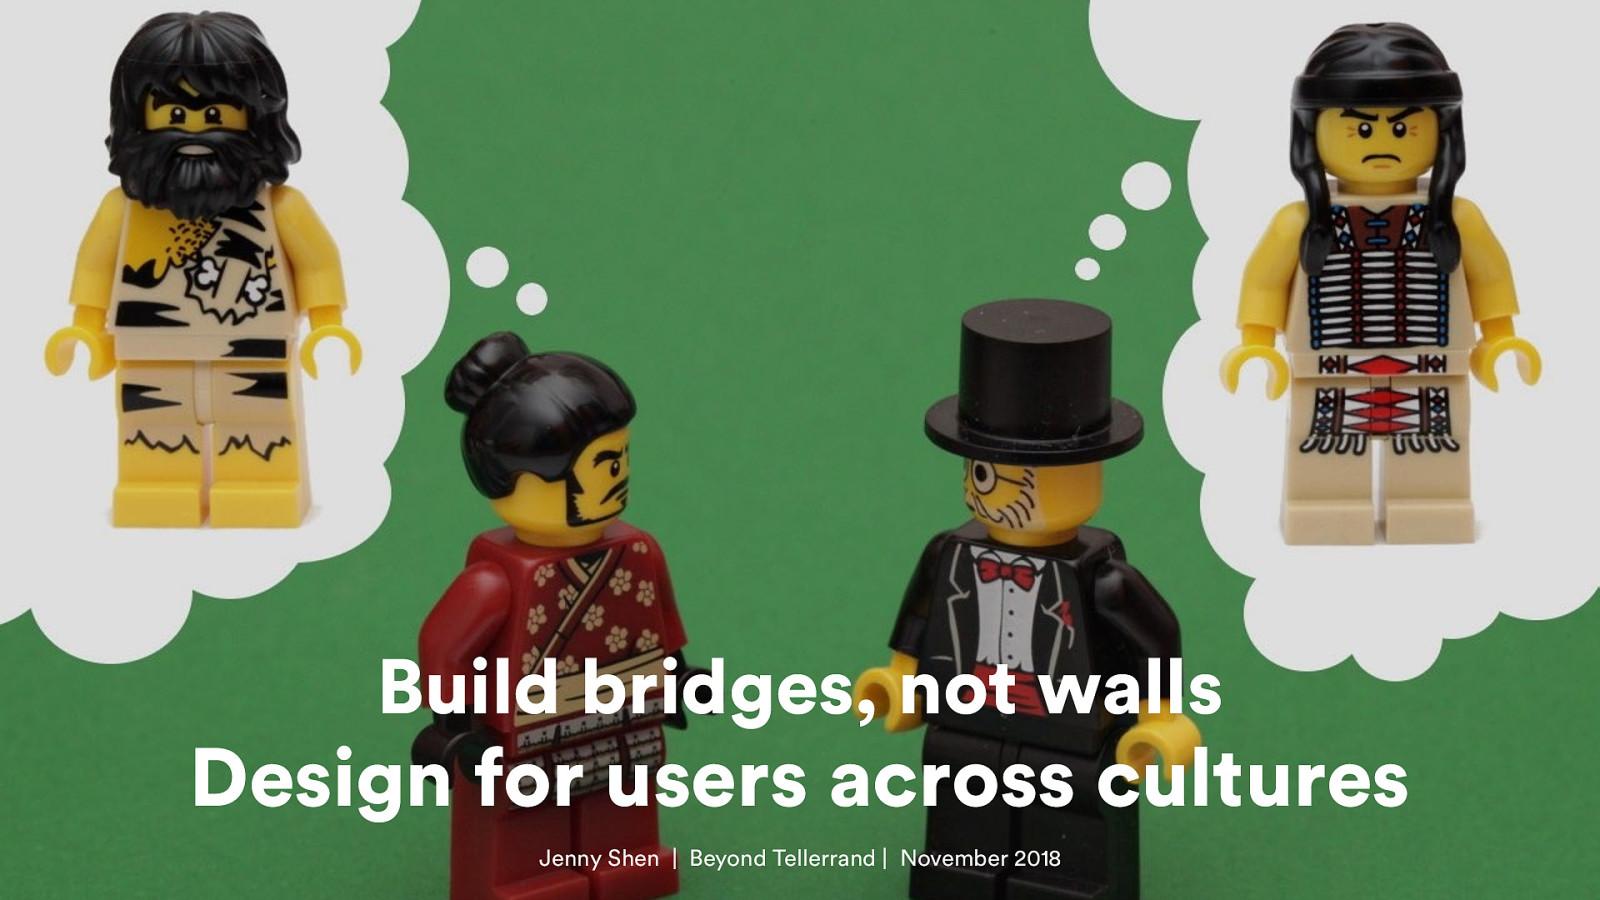 Build bridges, not walls—Design for users across cultures